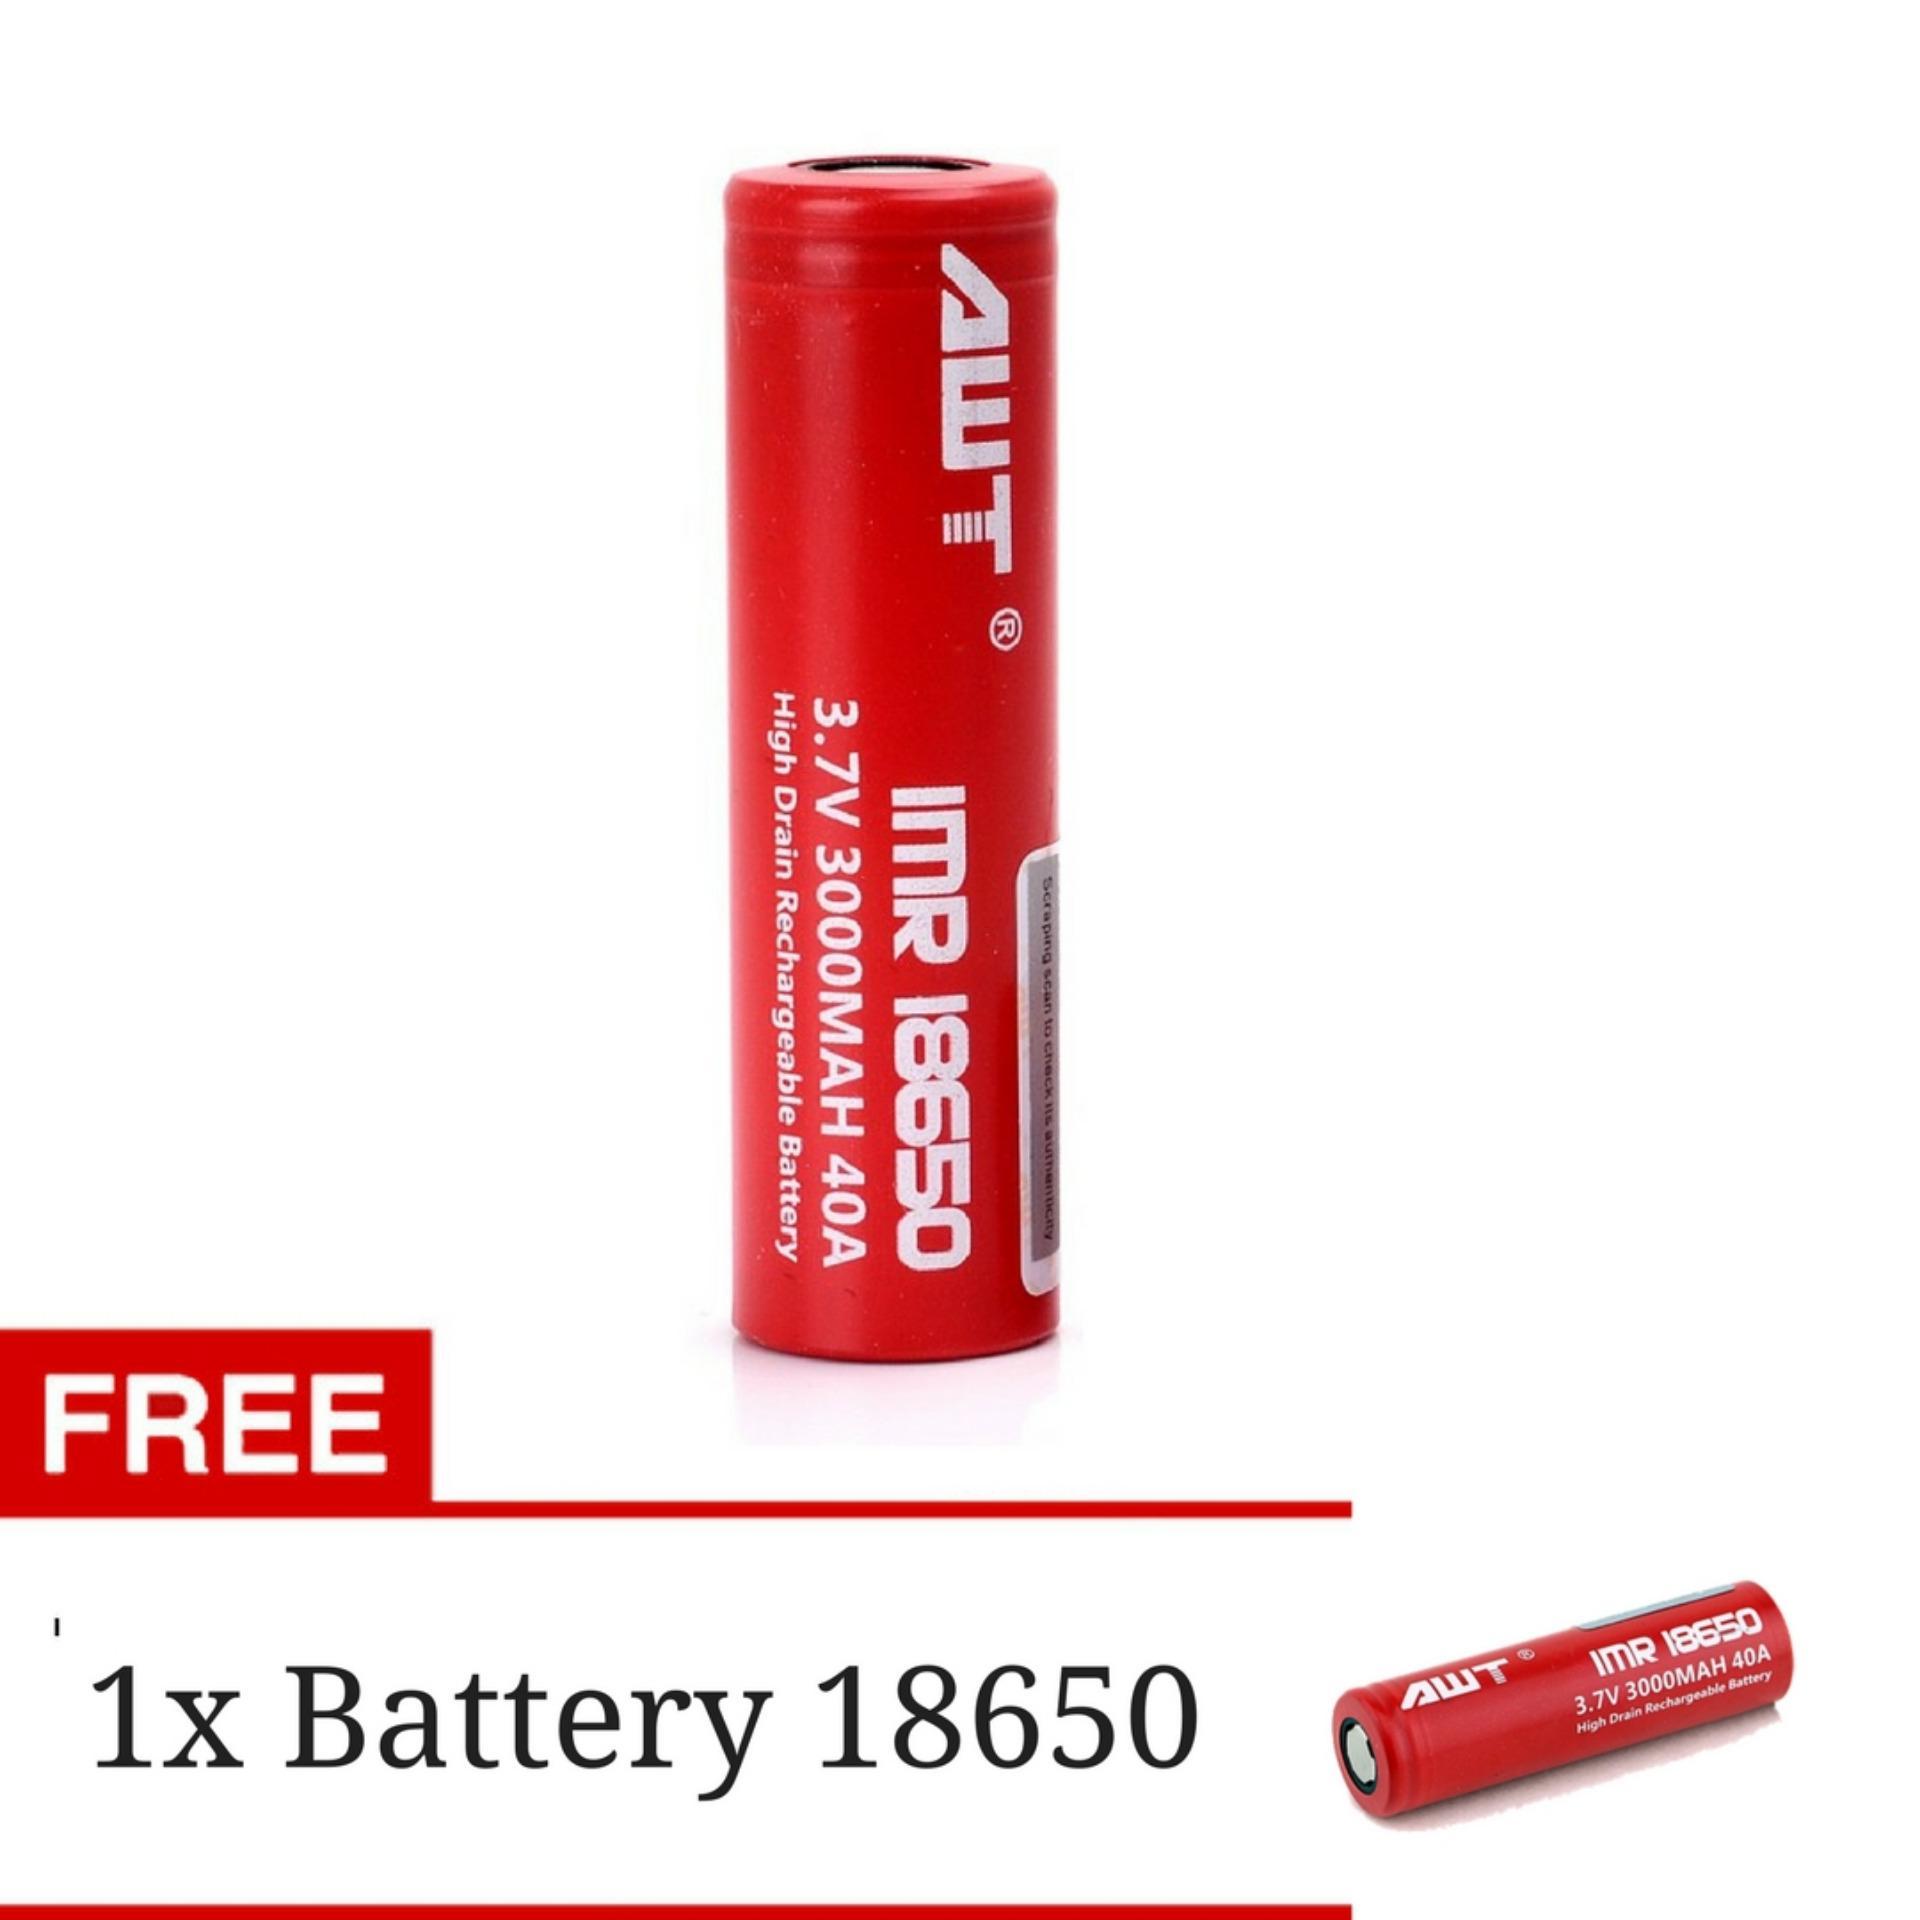 ... AWT Battery IMR 18650 3000 Mah 3.7V 40A Baterai Rokok Elektrik +GRATIS 1 Battery ...